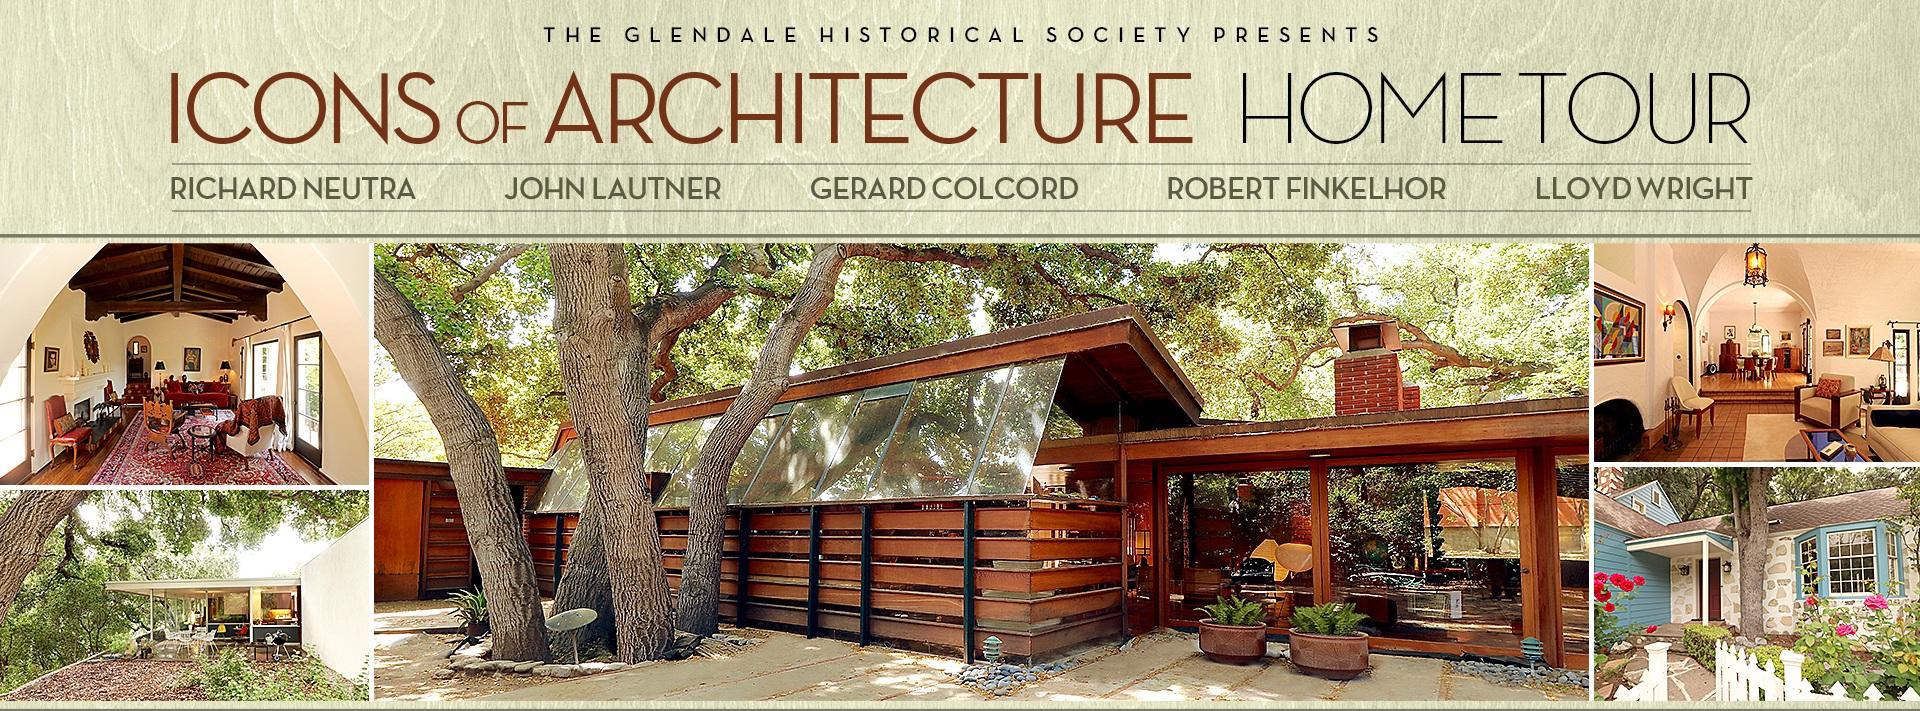 Glendale Ohio Christmas House Tour 2020 2019 Home Tour — The Glendale Historical Society